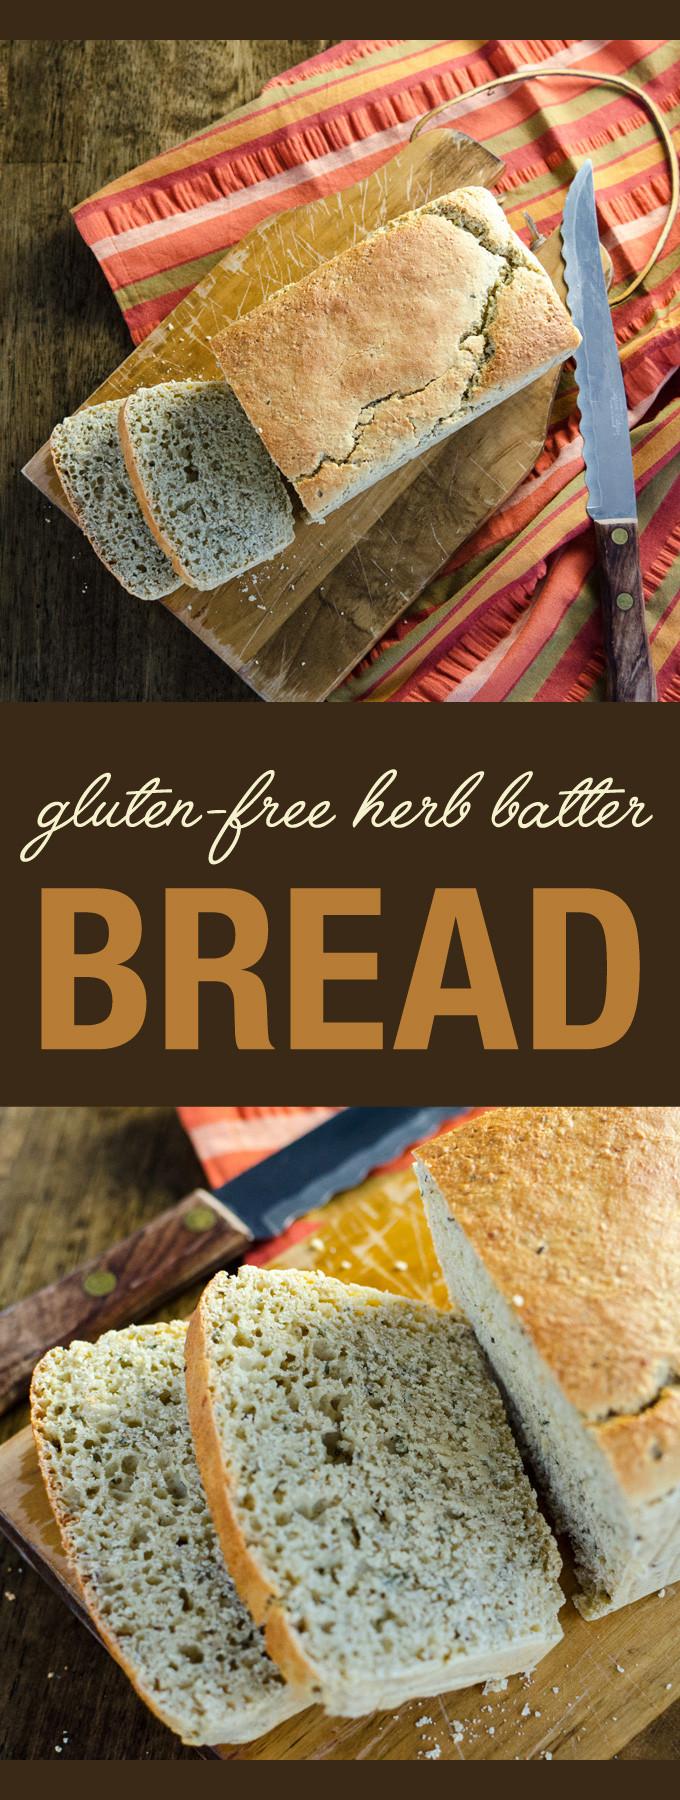 Gluten Free Vegan Bread Brands  Gluten Free Herb Batter Bread